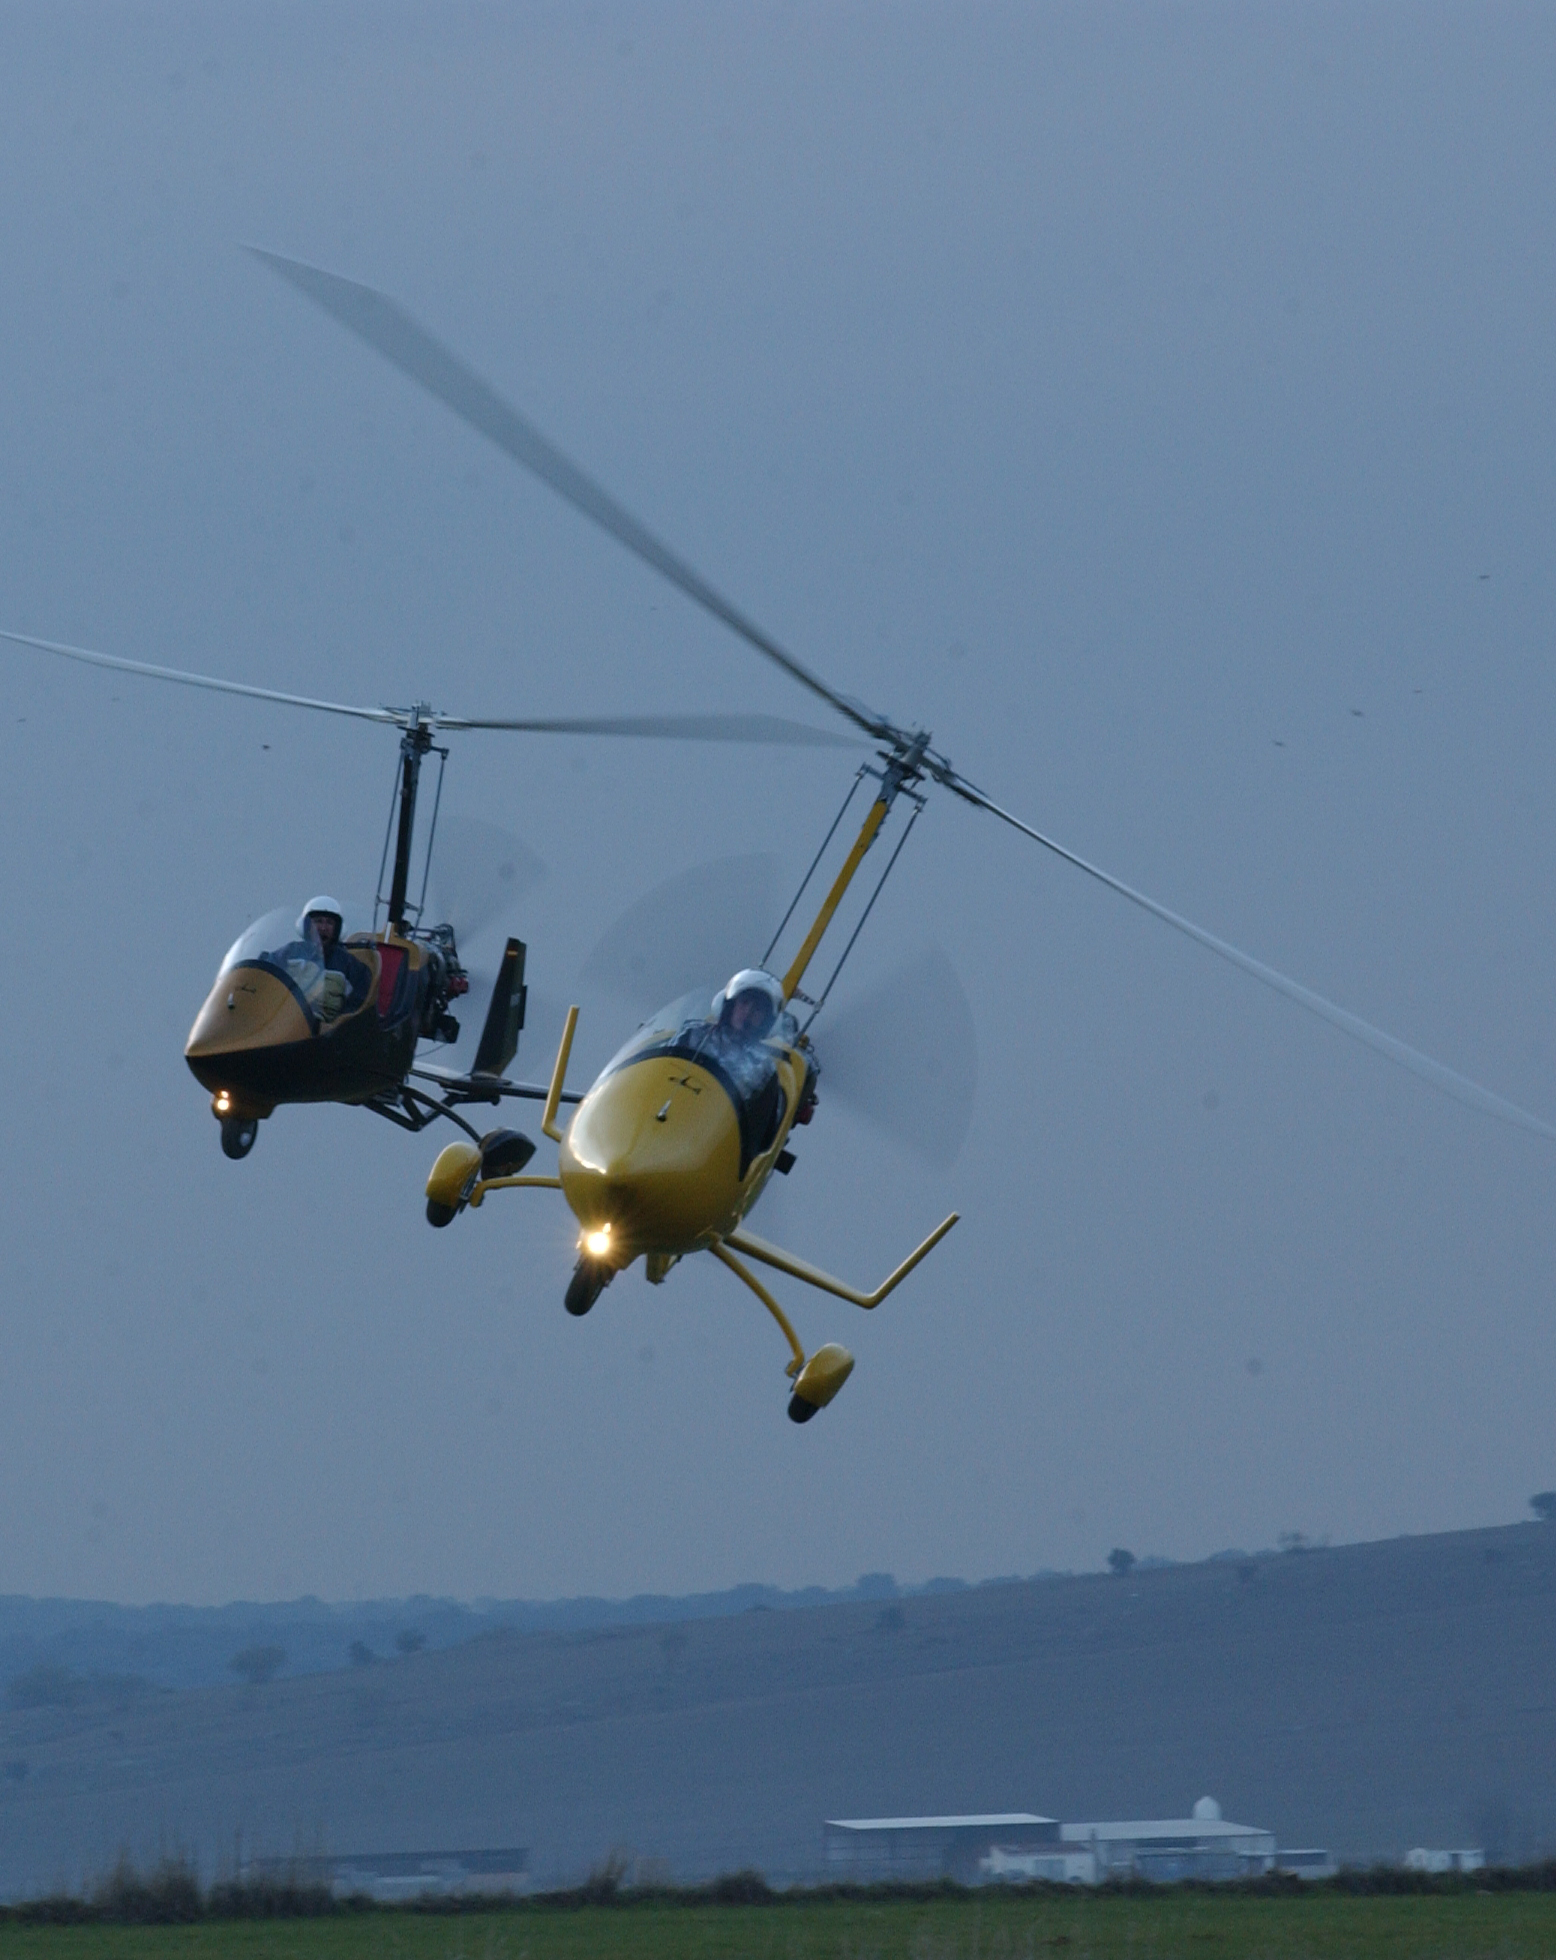 gyrocopter autogiro ela aviacion two of them